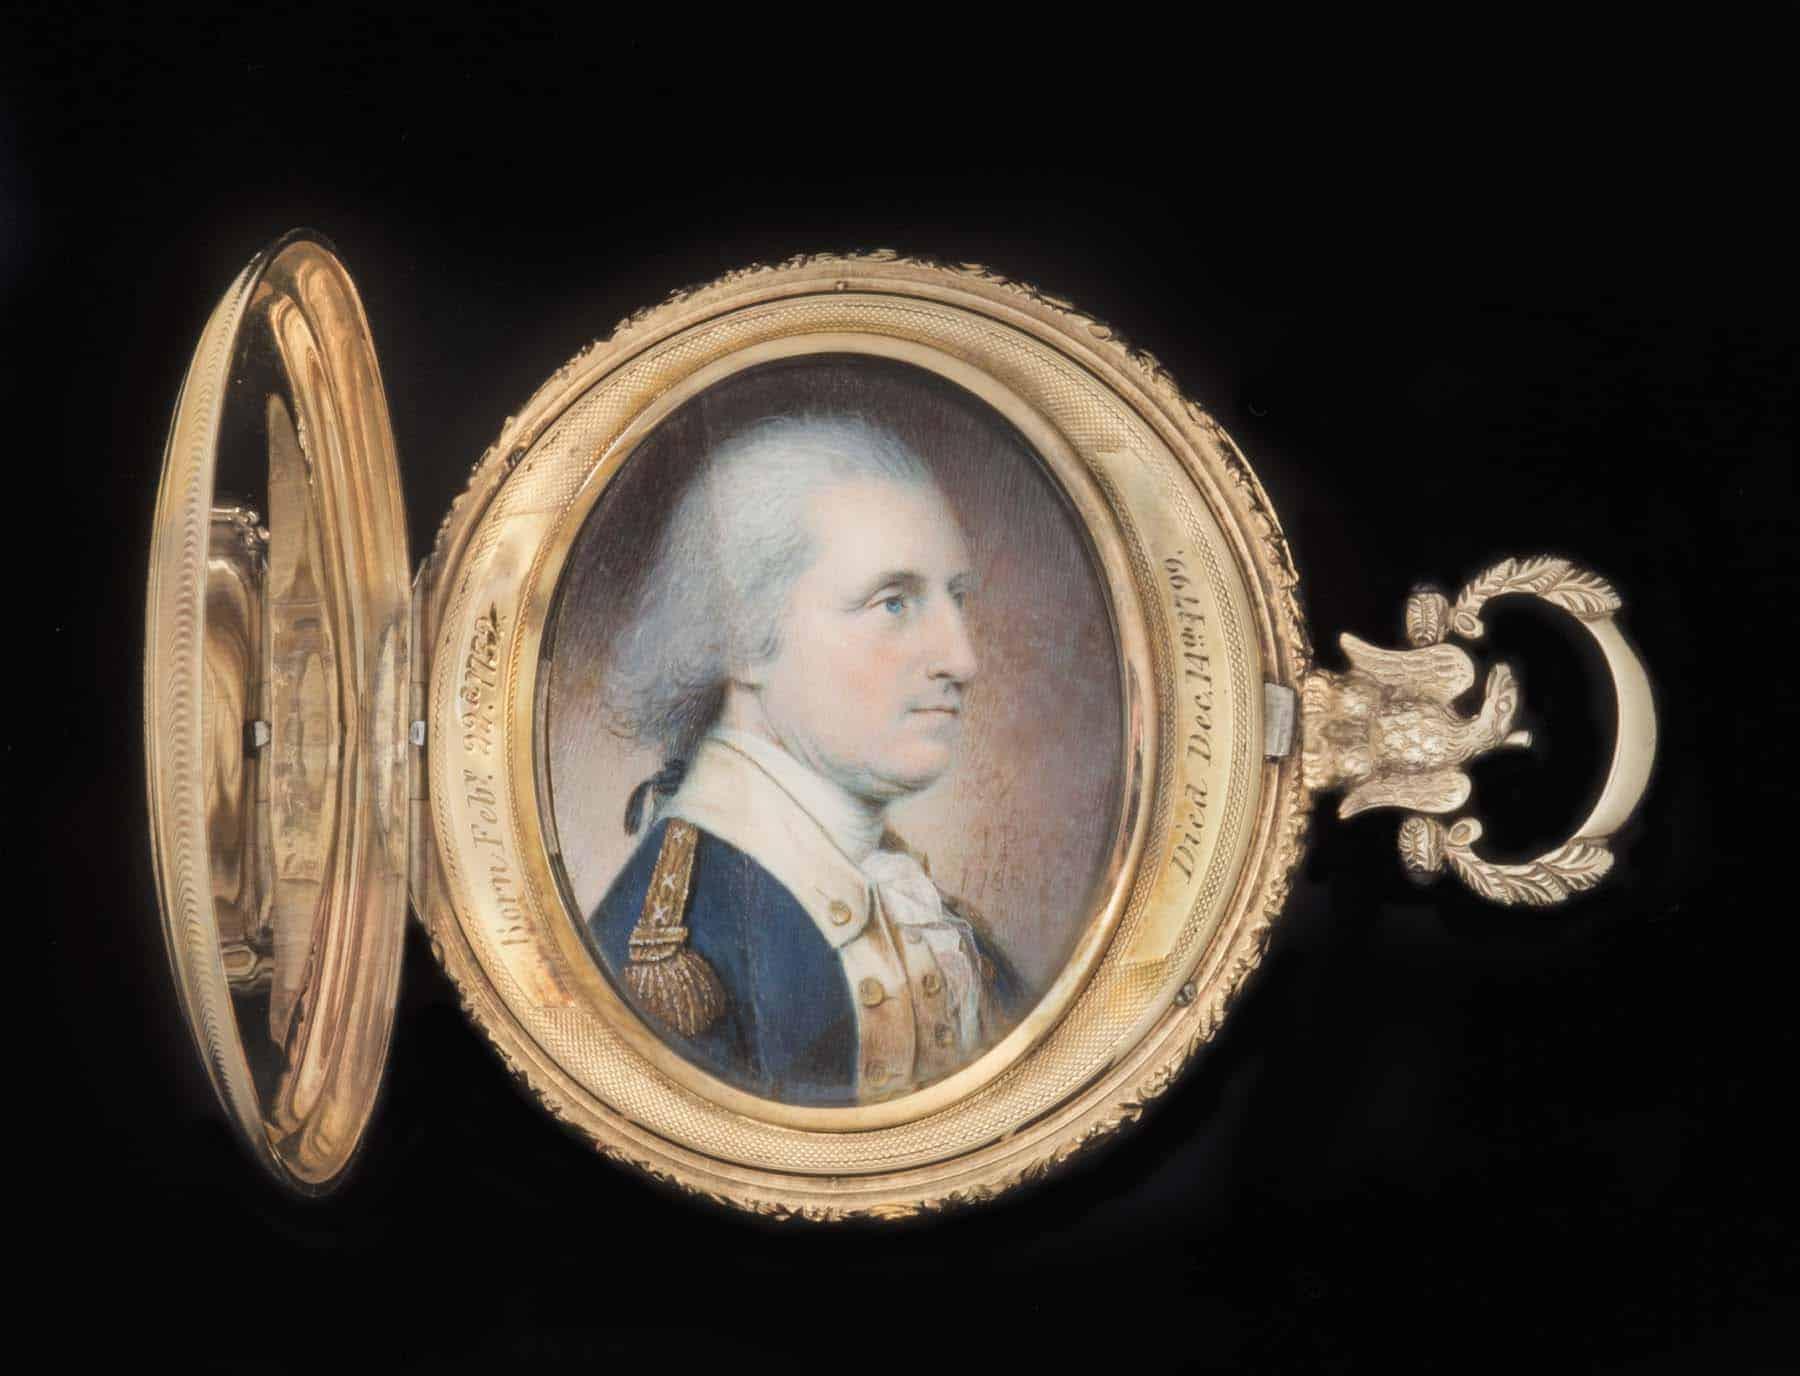 Americana Collector H. Richard Dietrich Jr. A Collector's Vision Philadelphia Museum of Art miniature George Washington James Peale